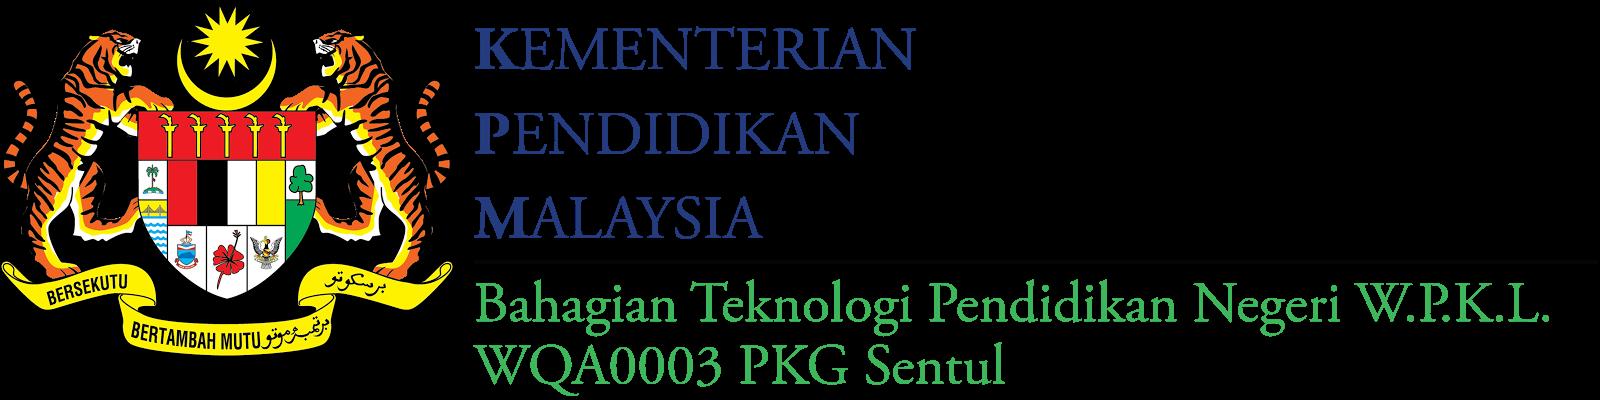 PKG Sentul